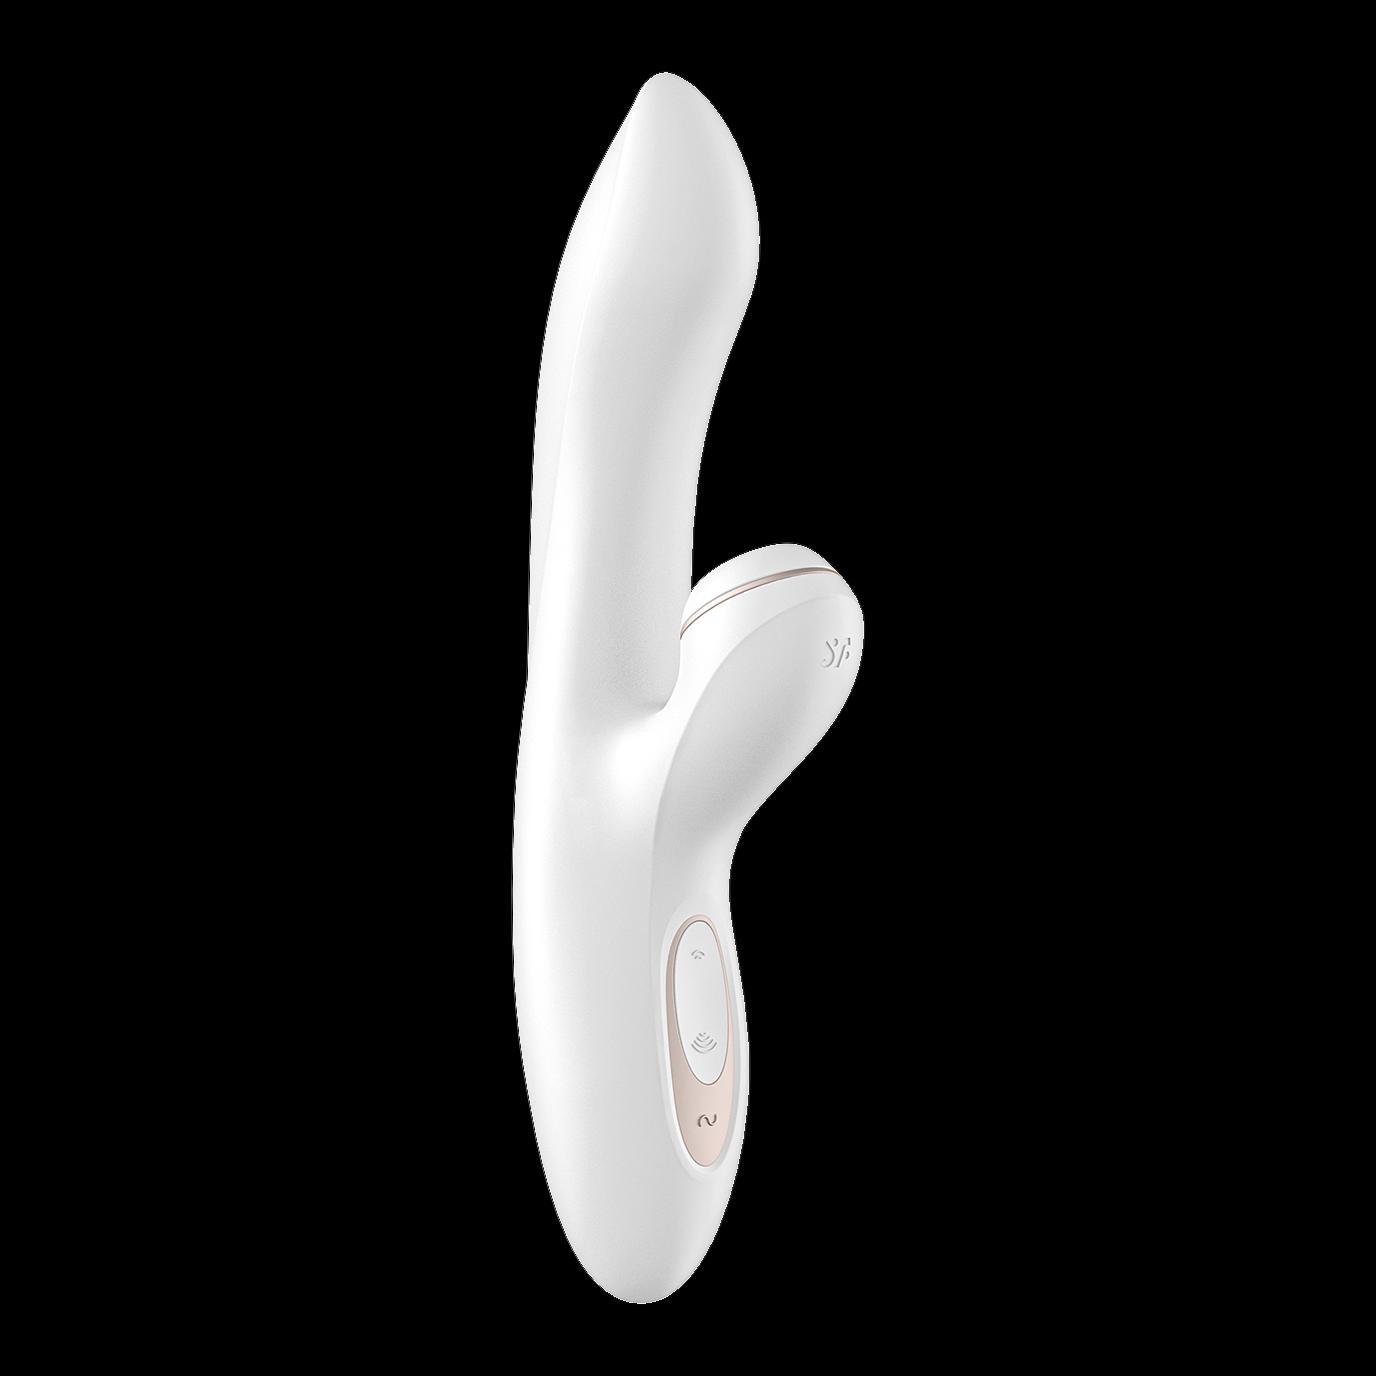 Satisfyer Pro G-Spot Rabbit (Klitoris-Sauger G-Punkt-Massage) - wasserdicht